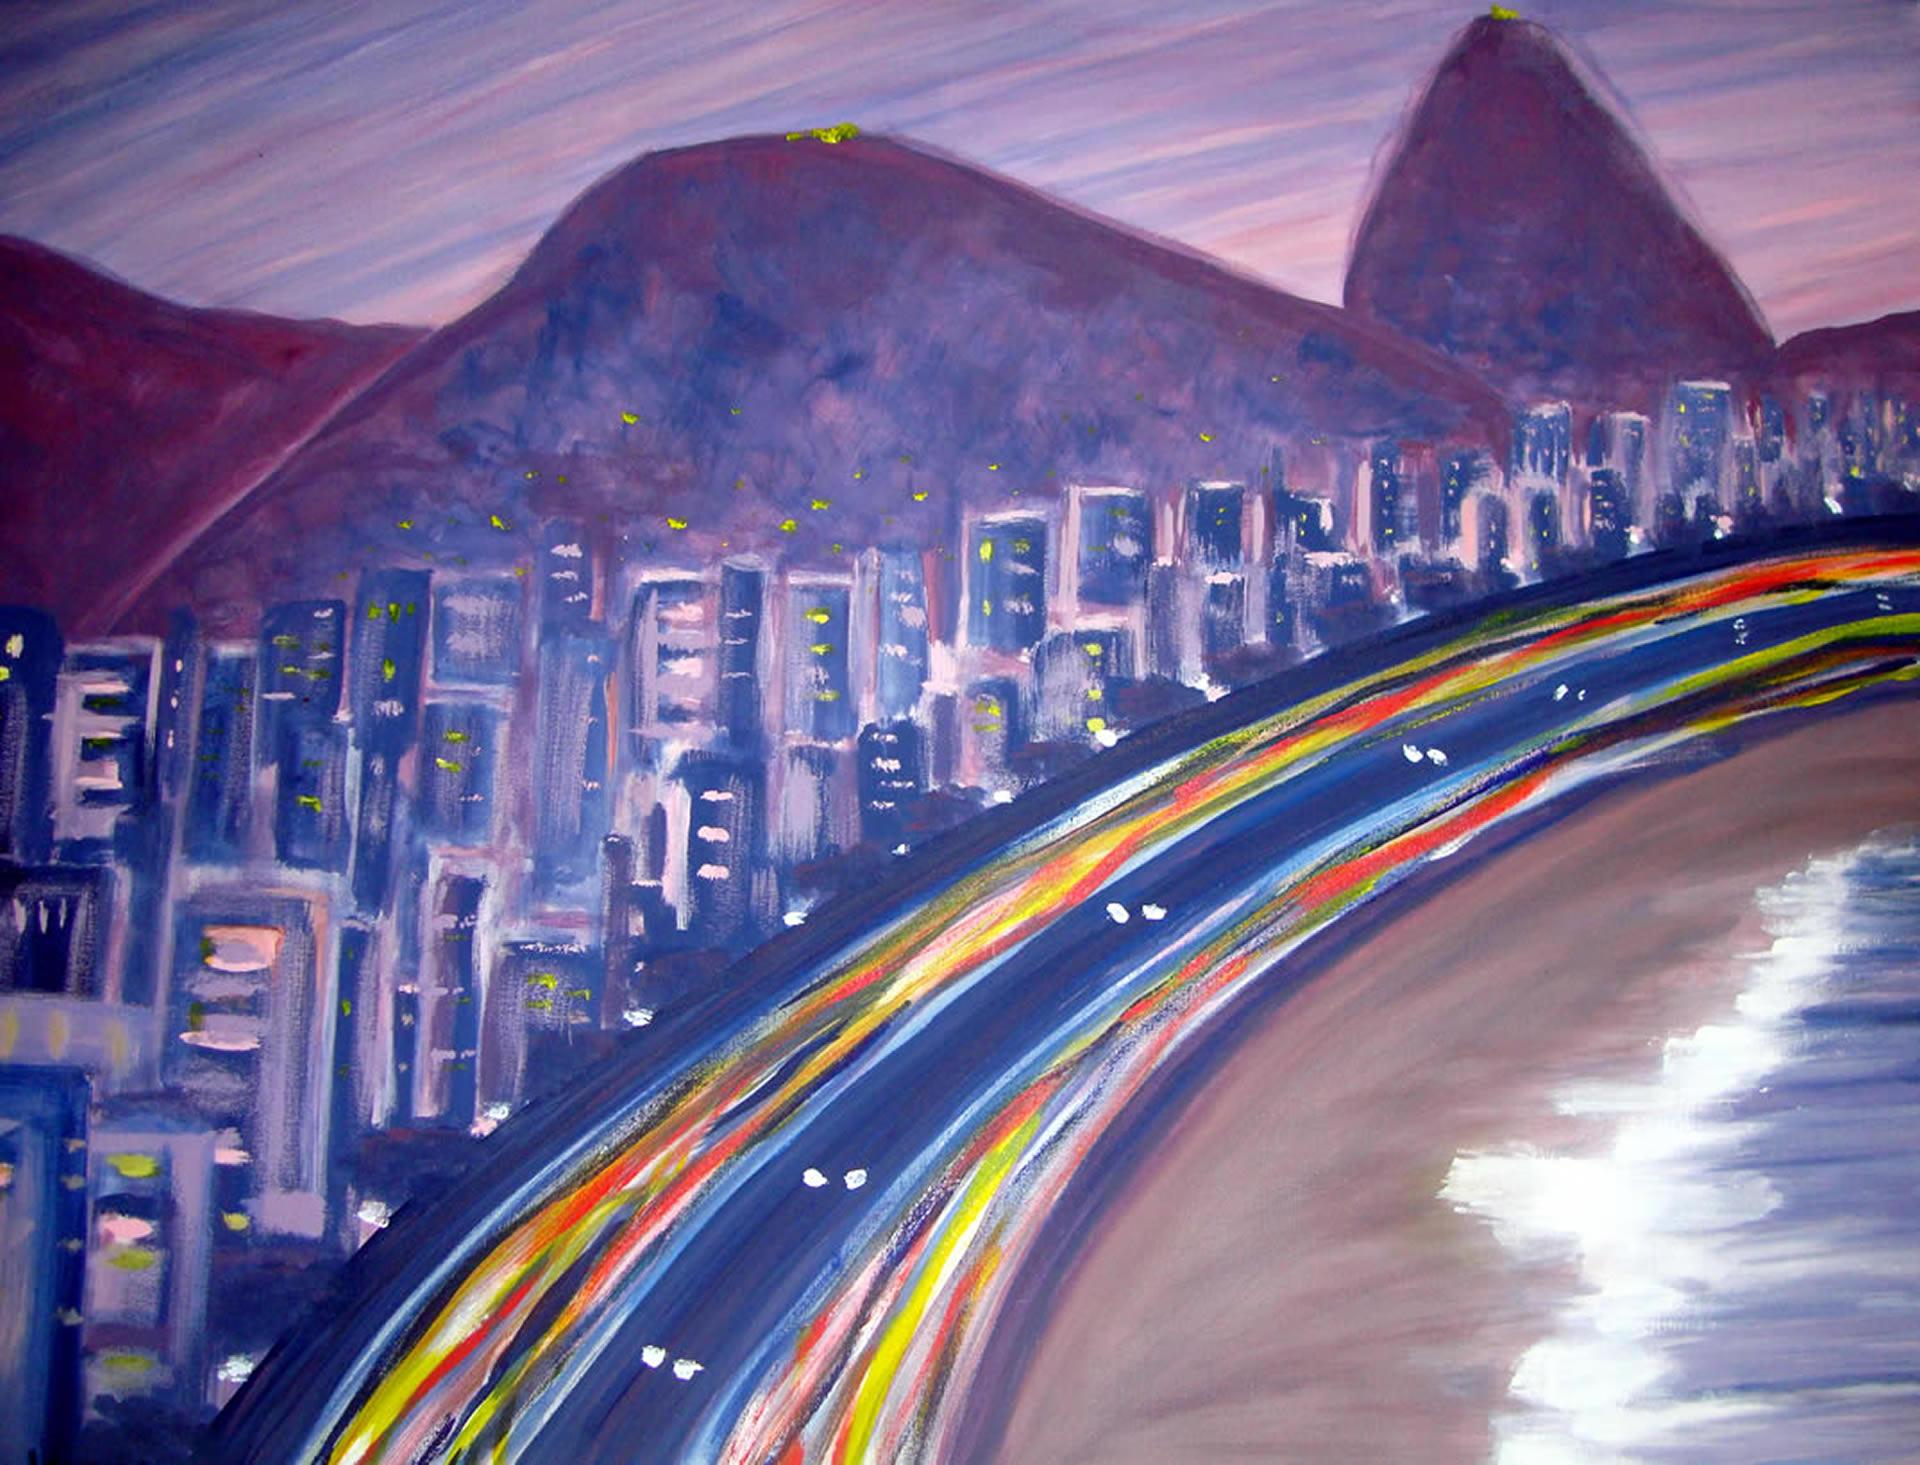 Copacabana Entardecer pintura acrilica angela lemos